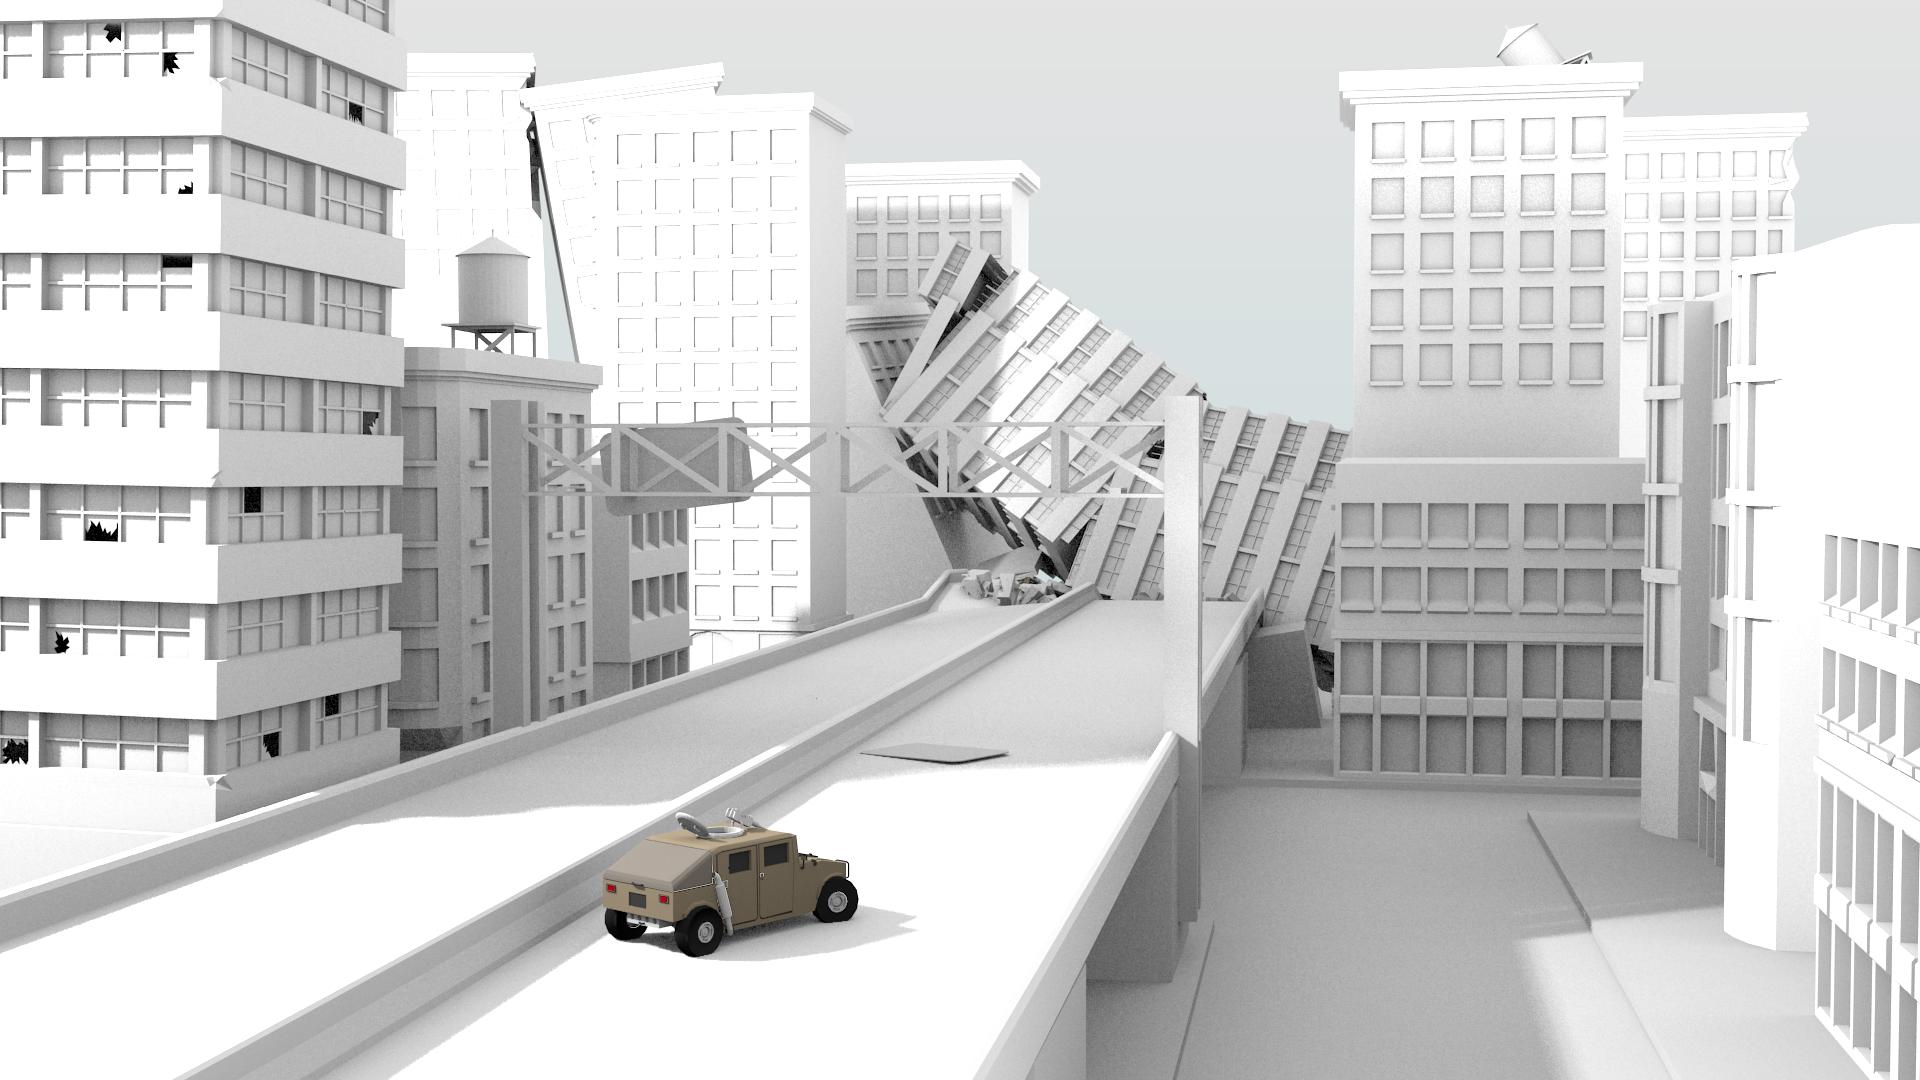 city collapse 2